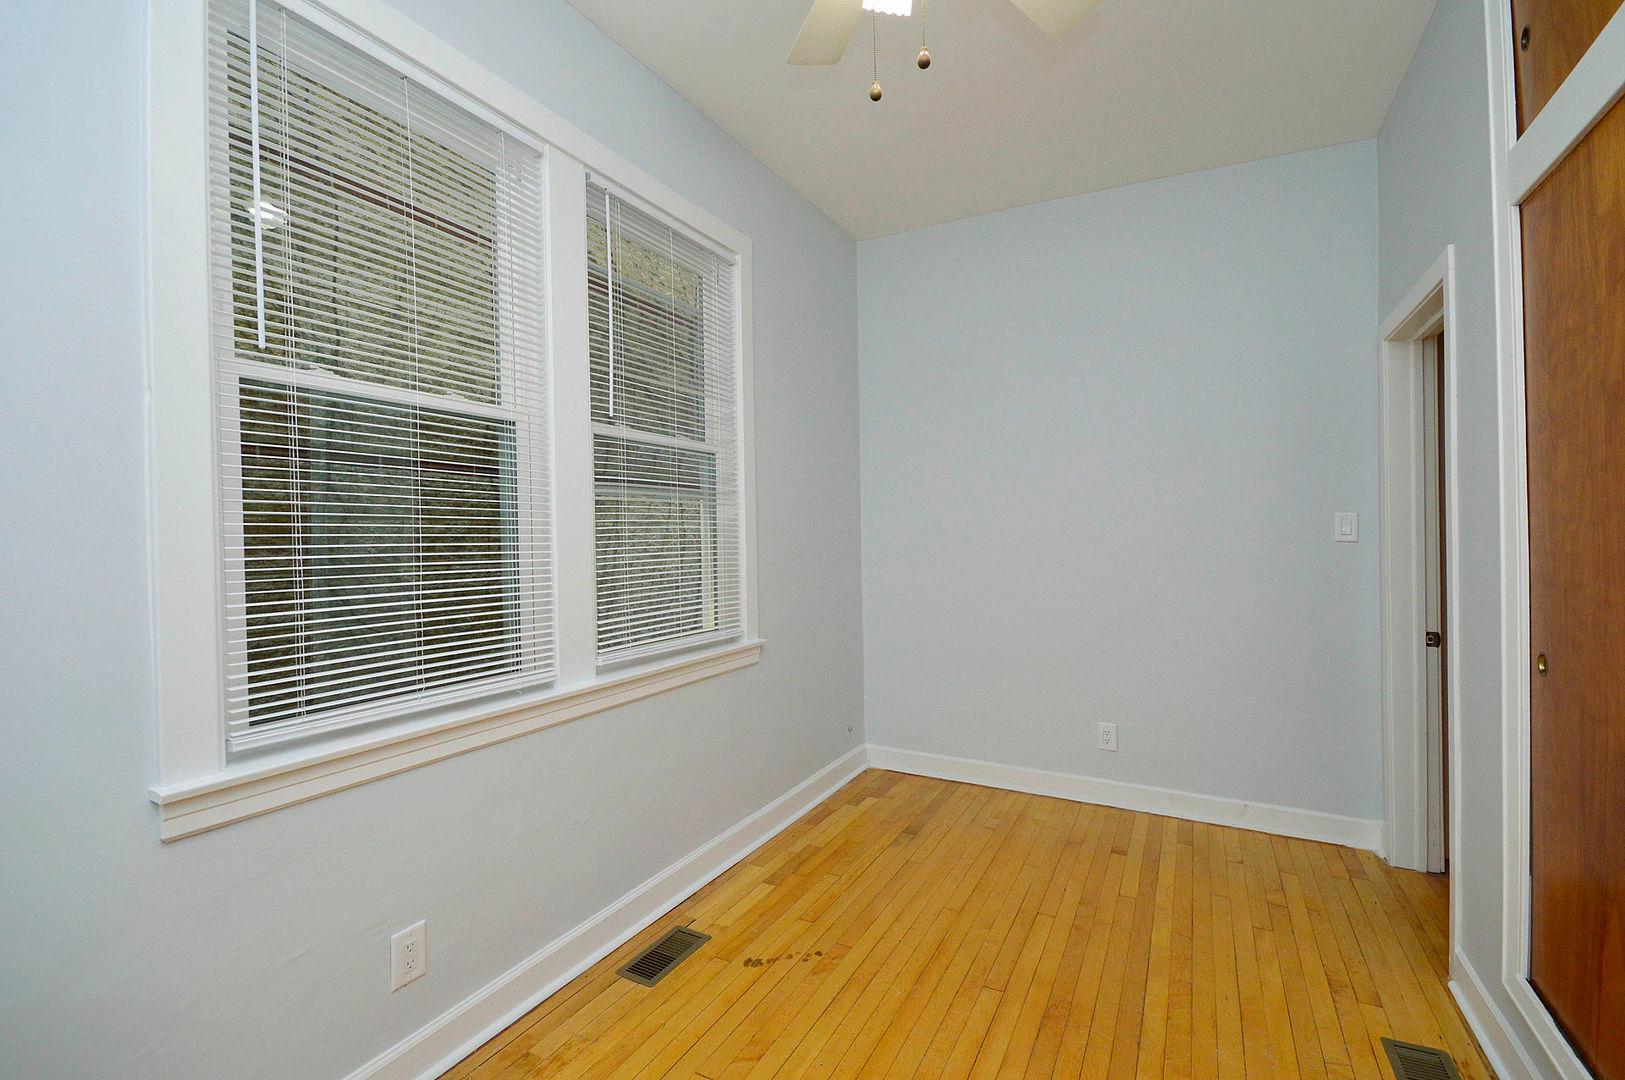 2905 N Burling  Street, Unit 1 photo